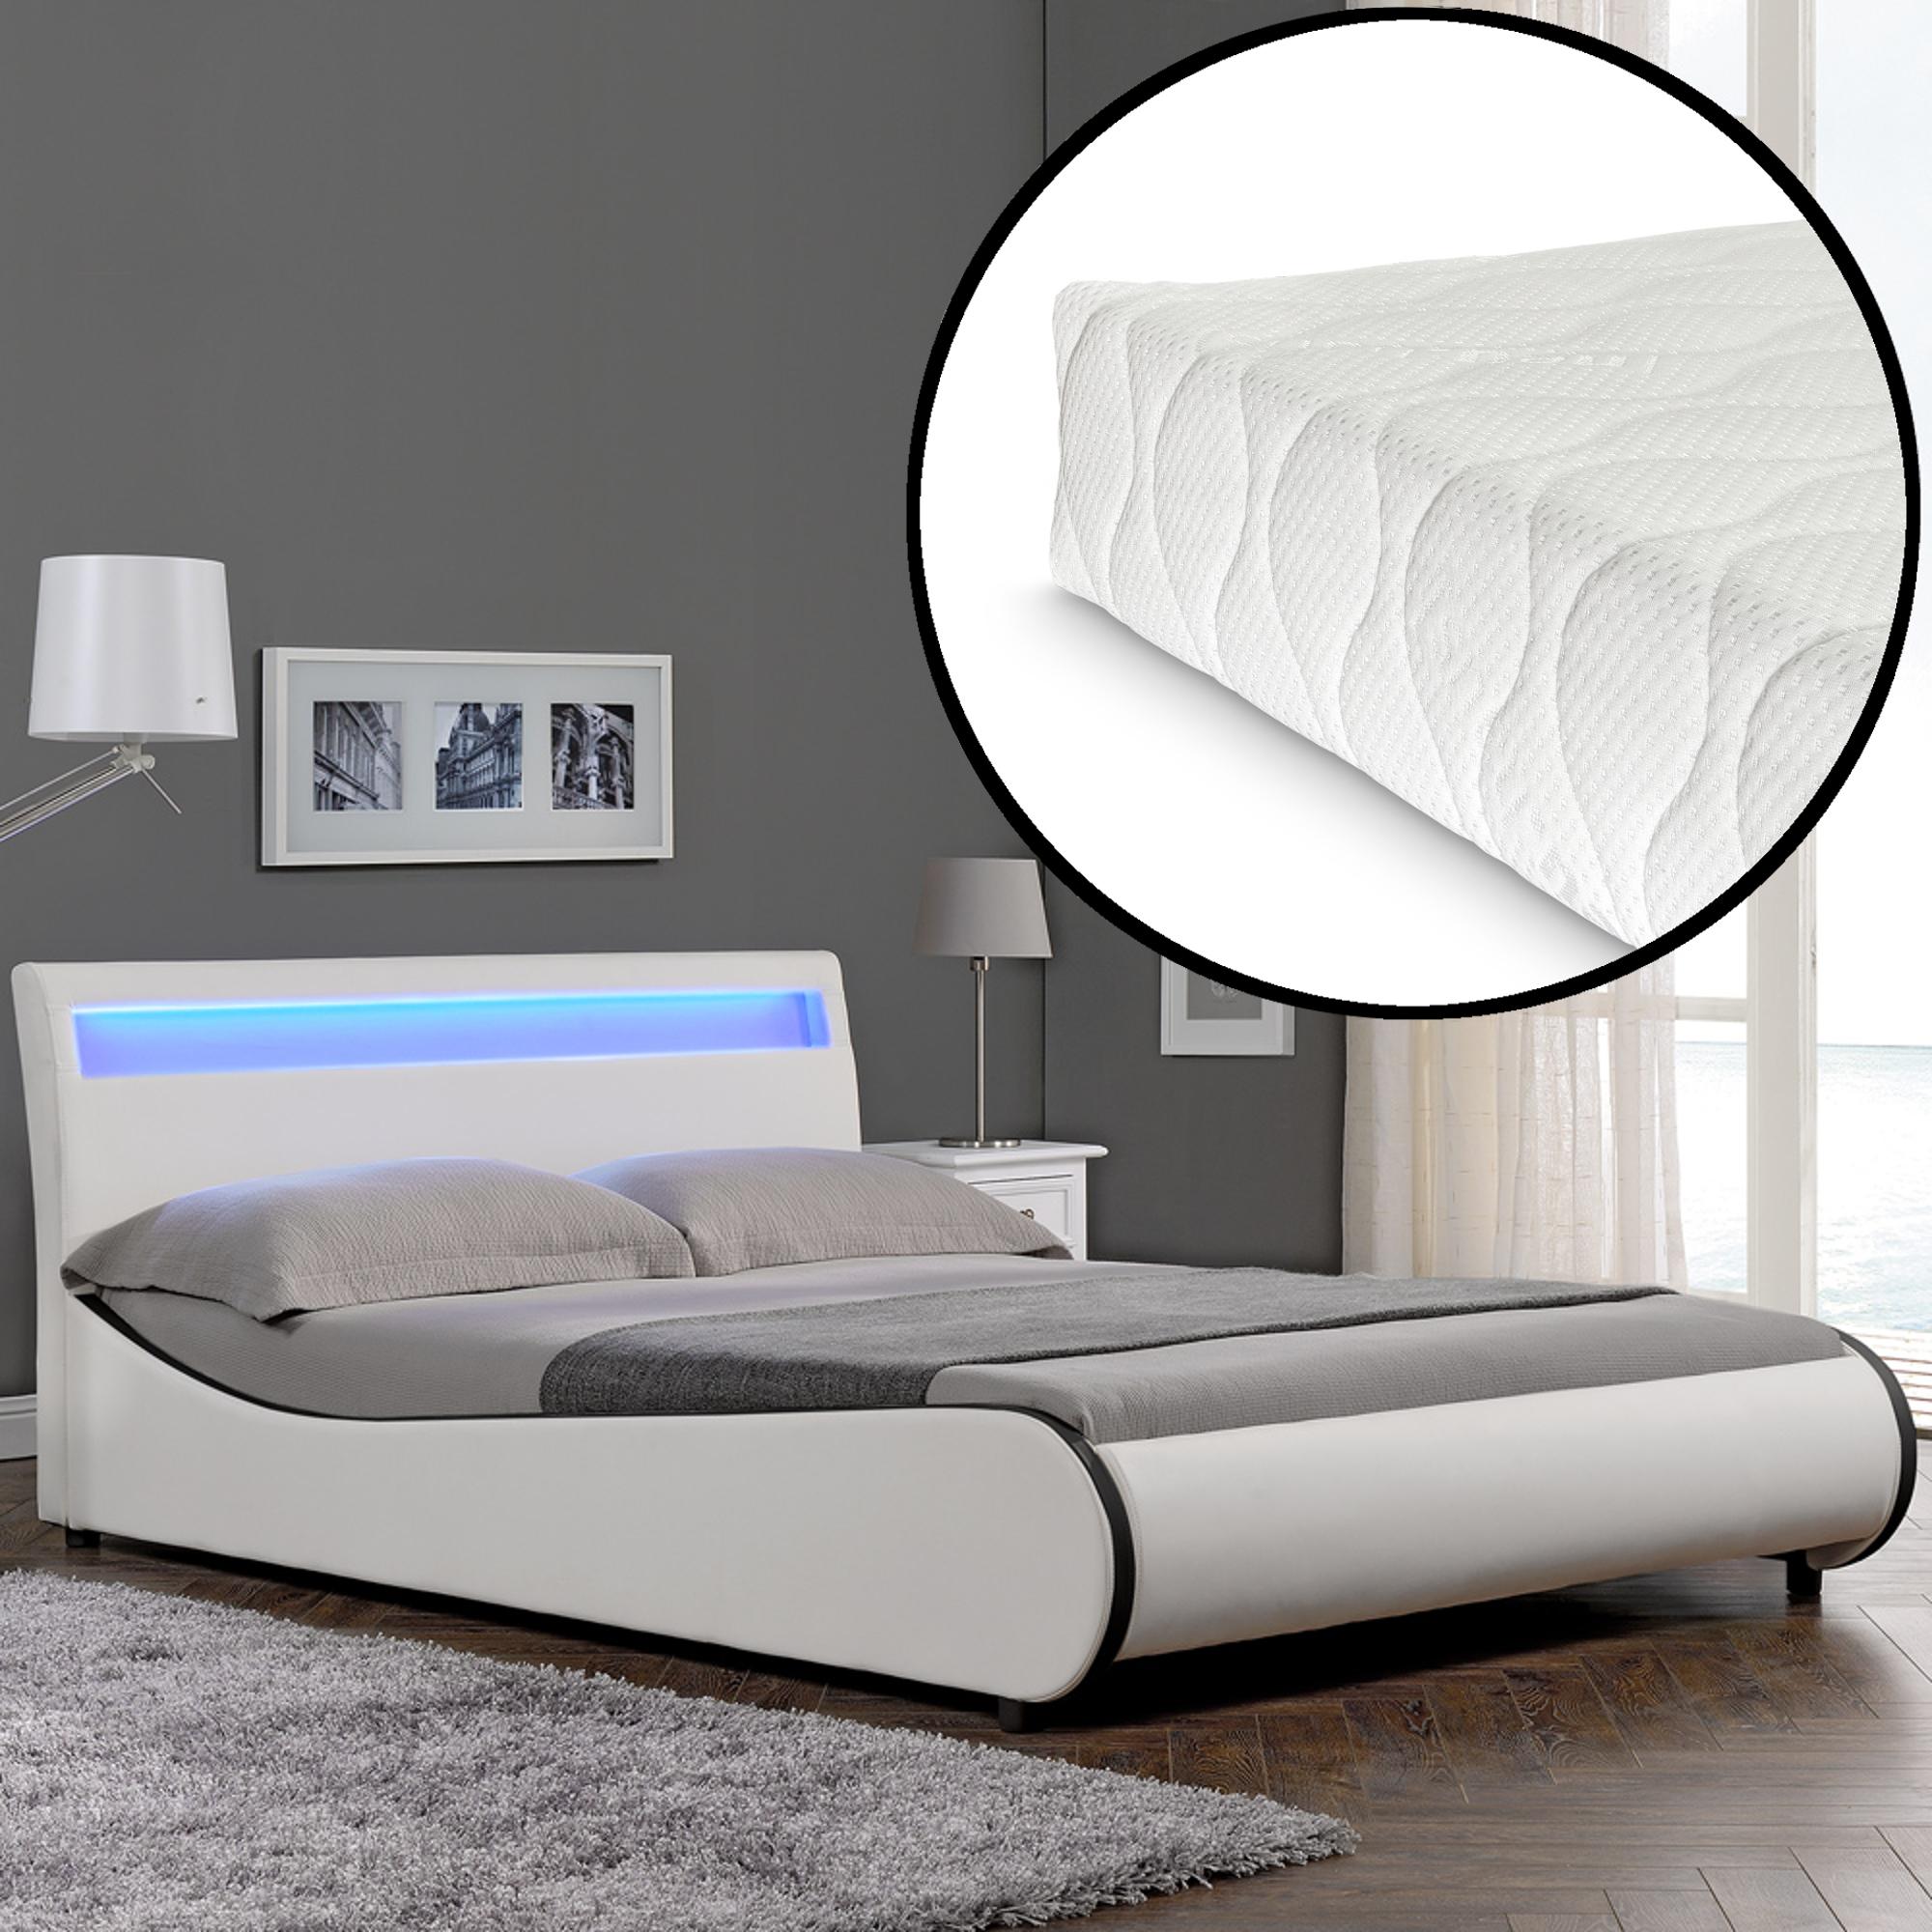 modernes bett 180x200 rattanbett bett barika bananenblatt in komforth he bett 180x200 youtube. Black Bedroom Furniture Sets. Home Design Ideas